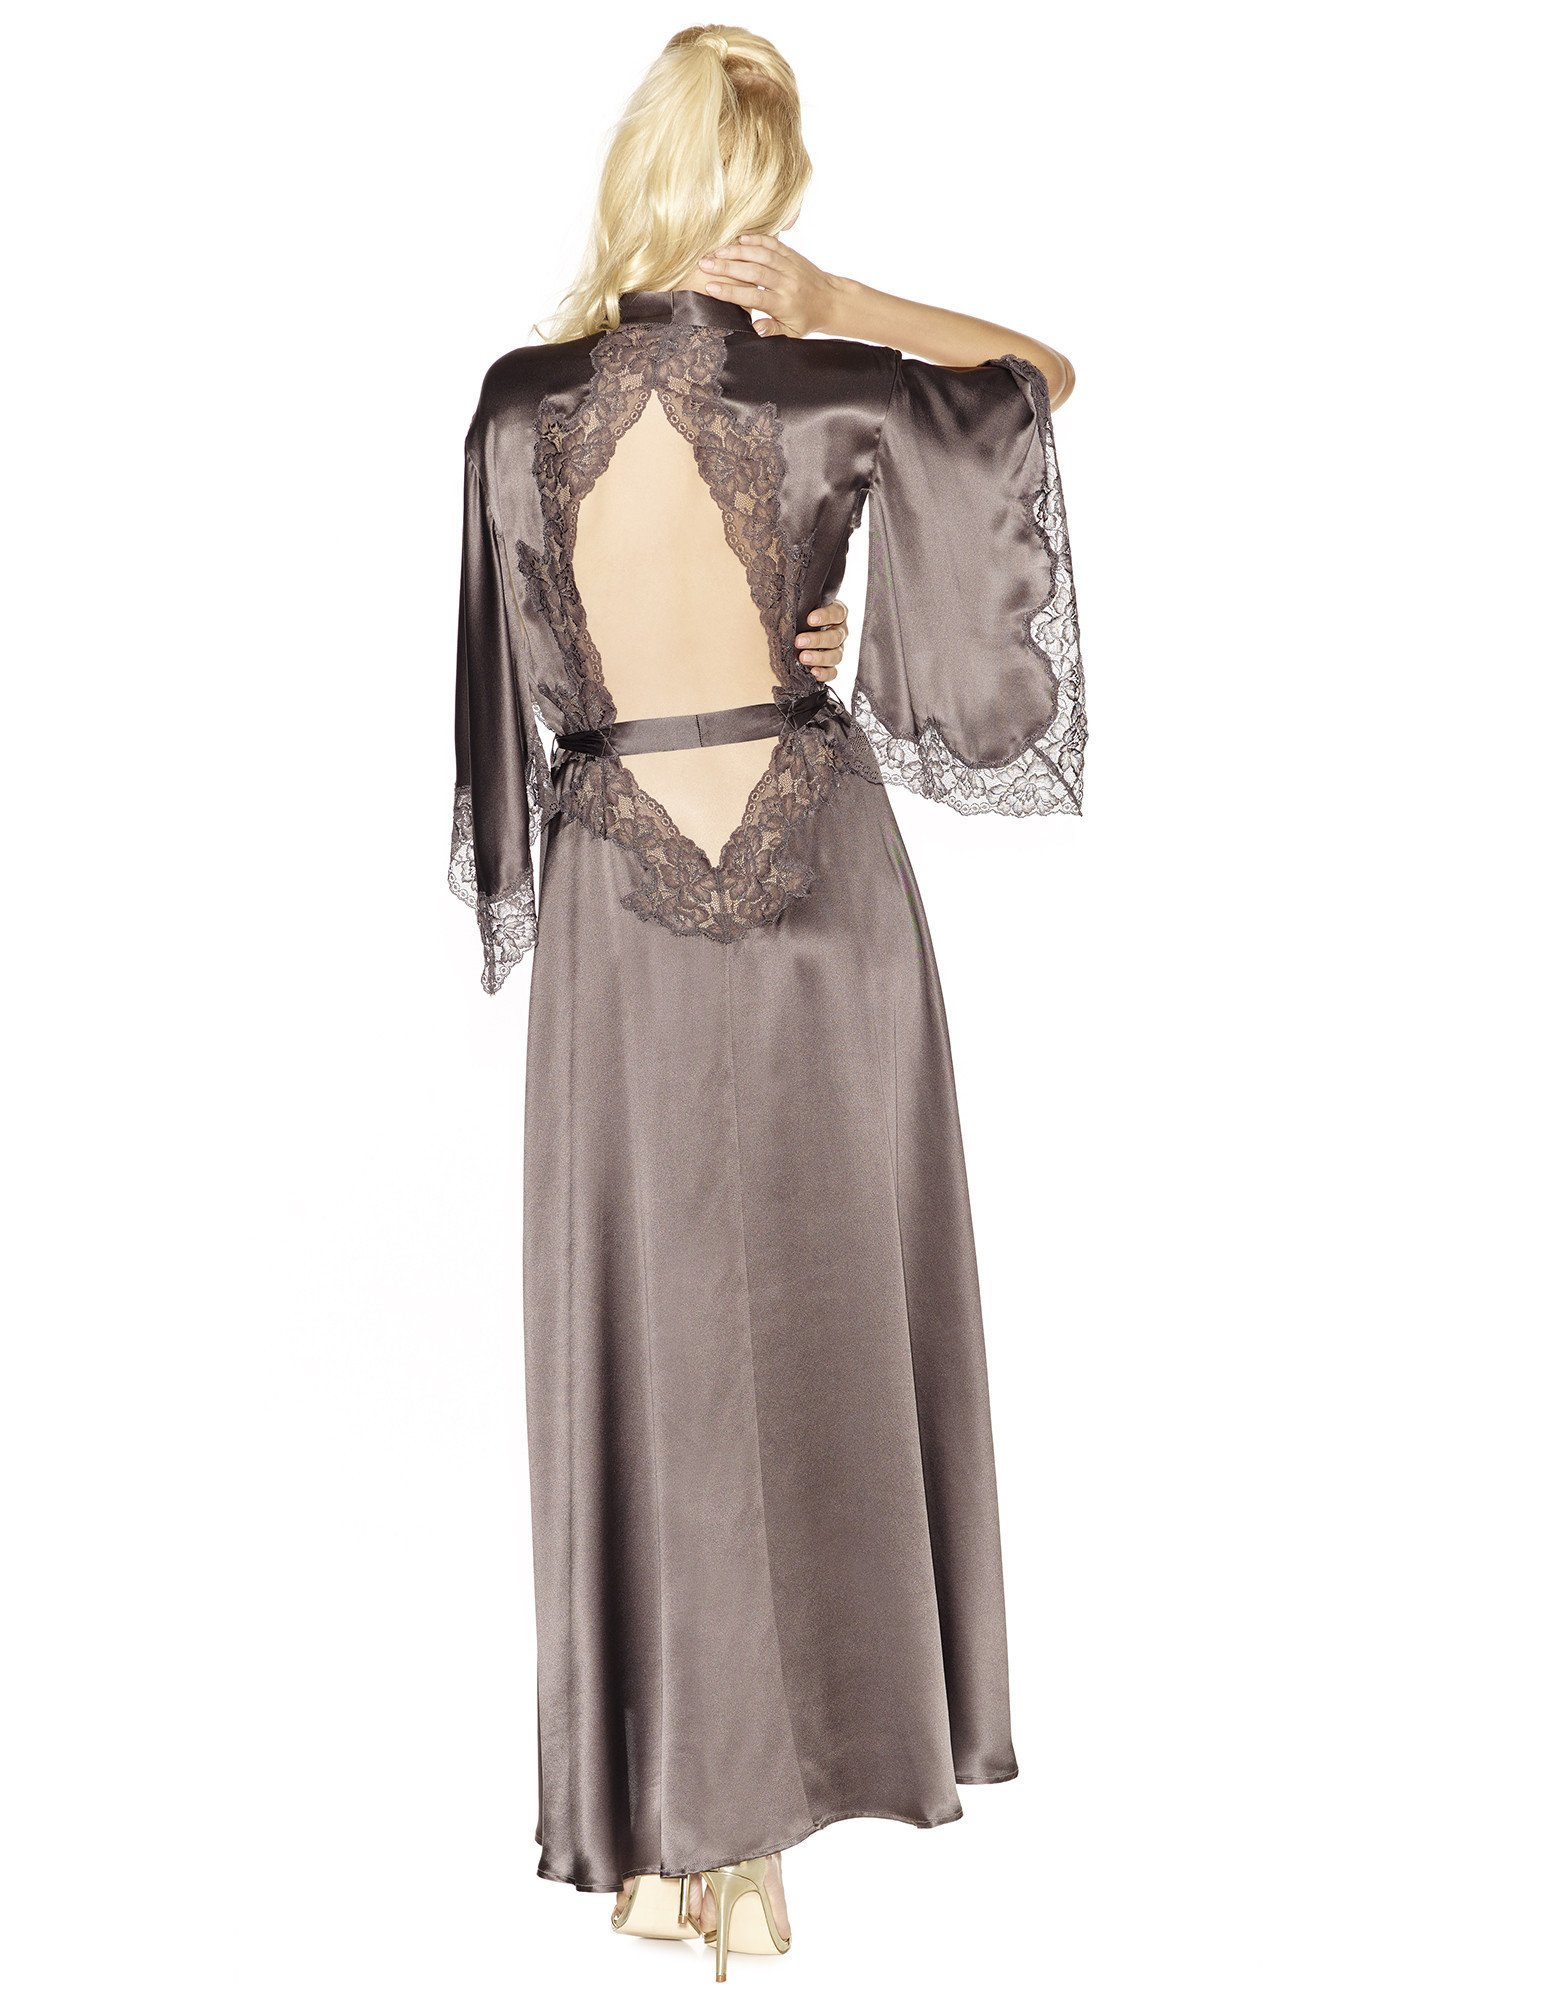 32. Estrella Long Kimono $307. S-L. Grey